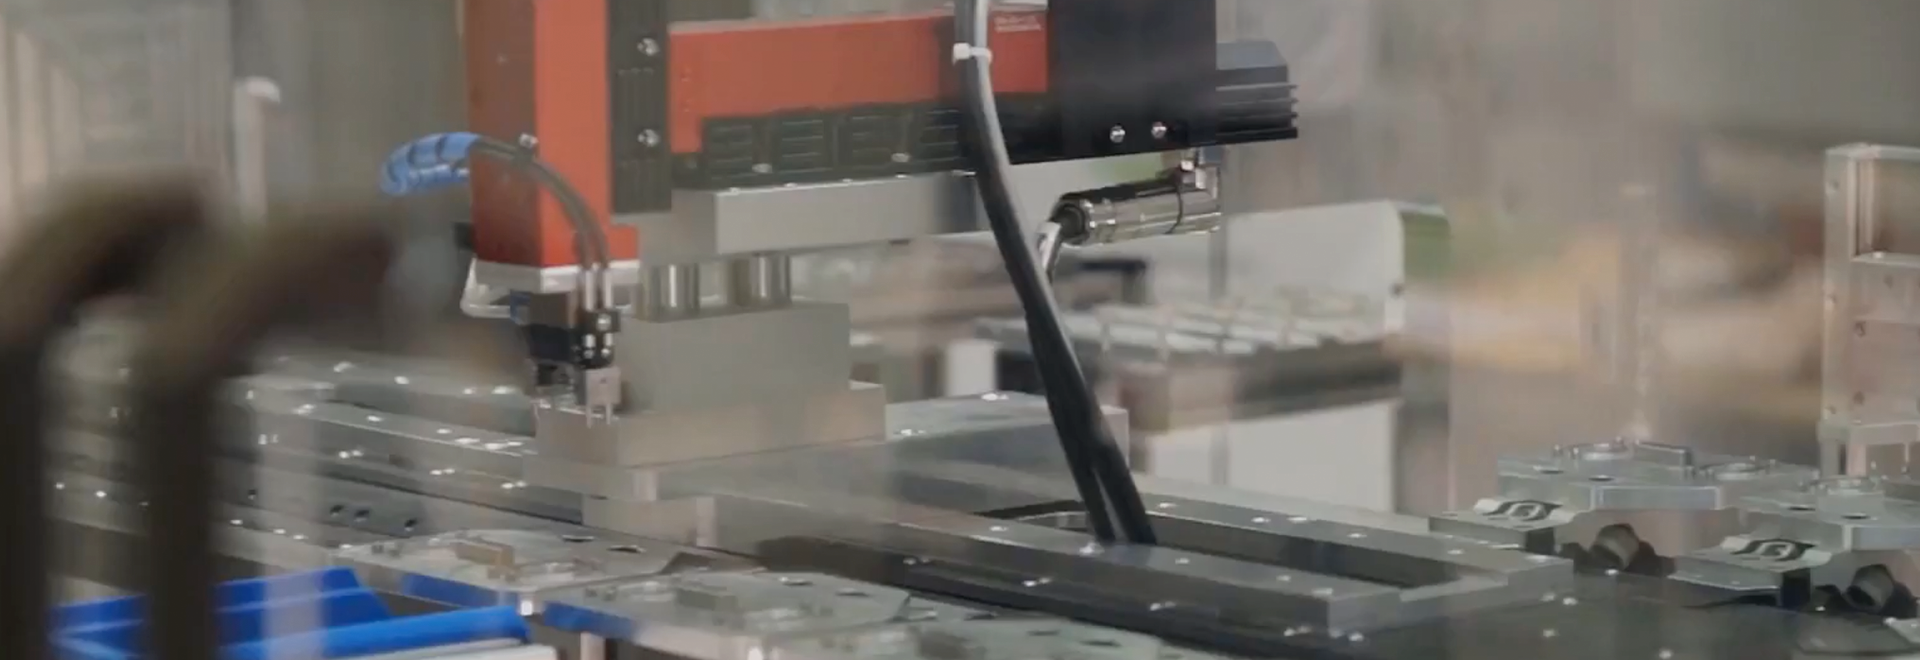 flex manufacturing